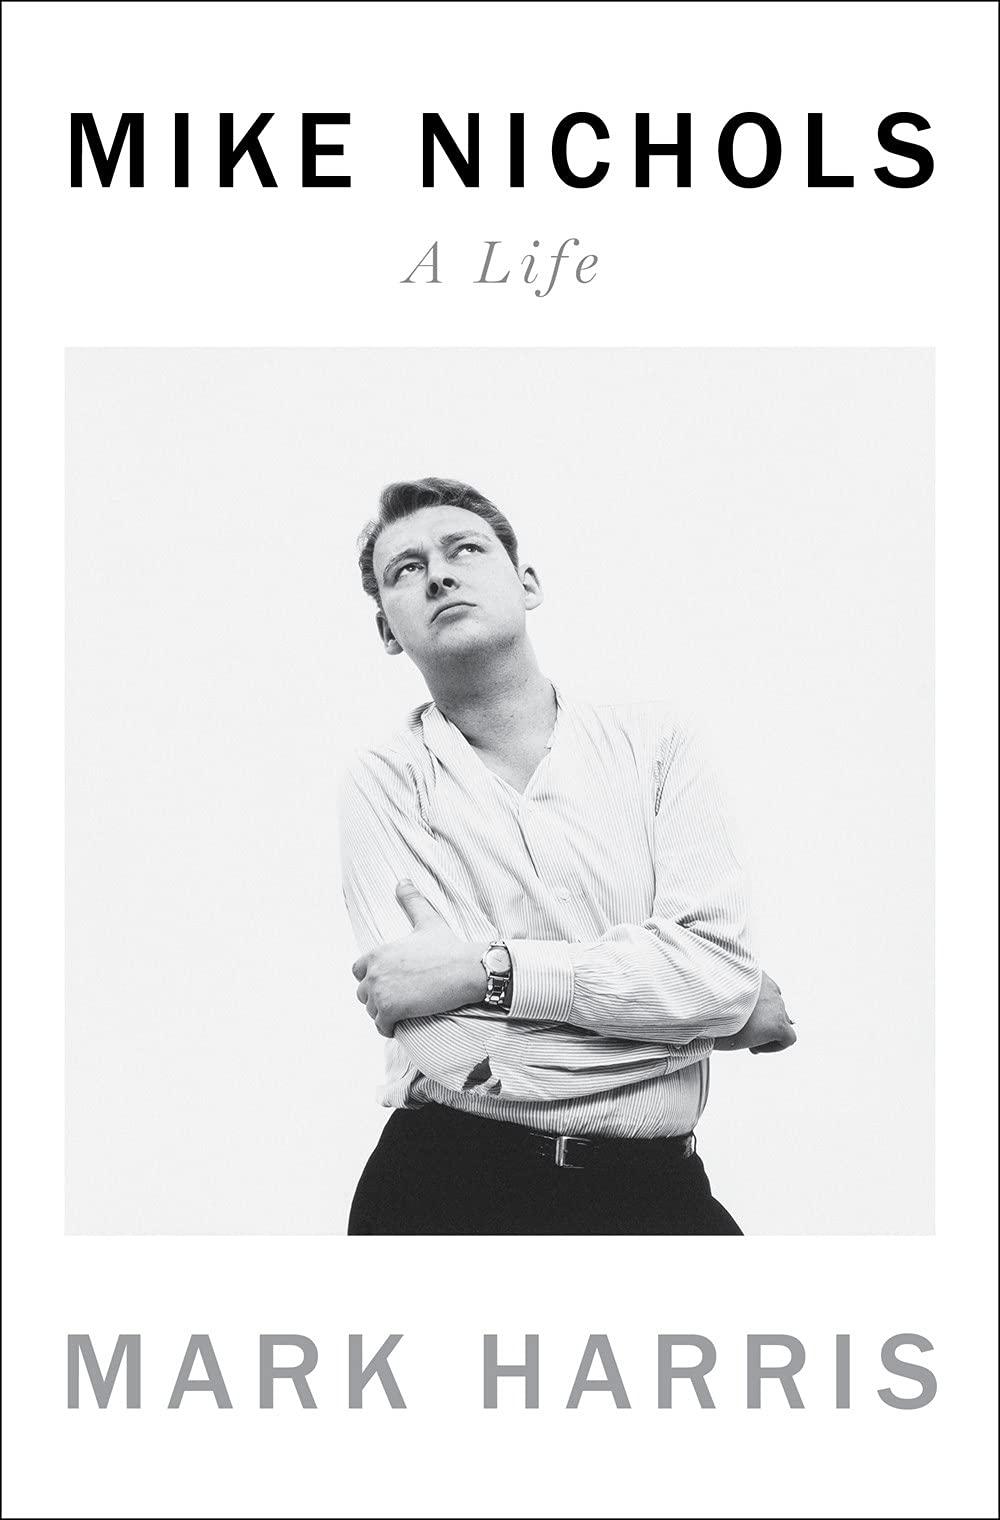 Mike Nichols A Life  Harris, Mark Amazon.de Bücher